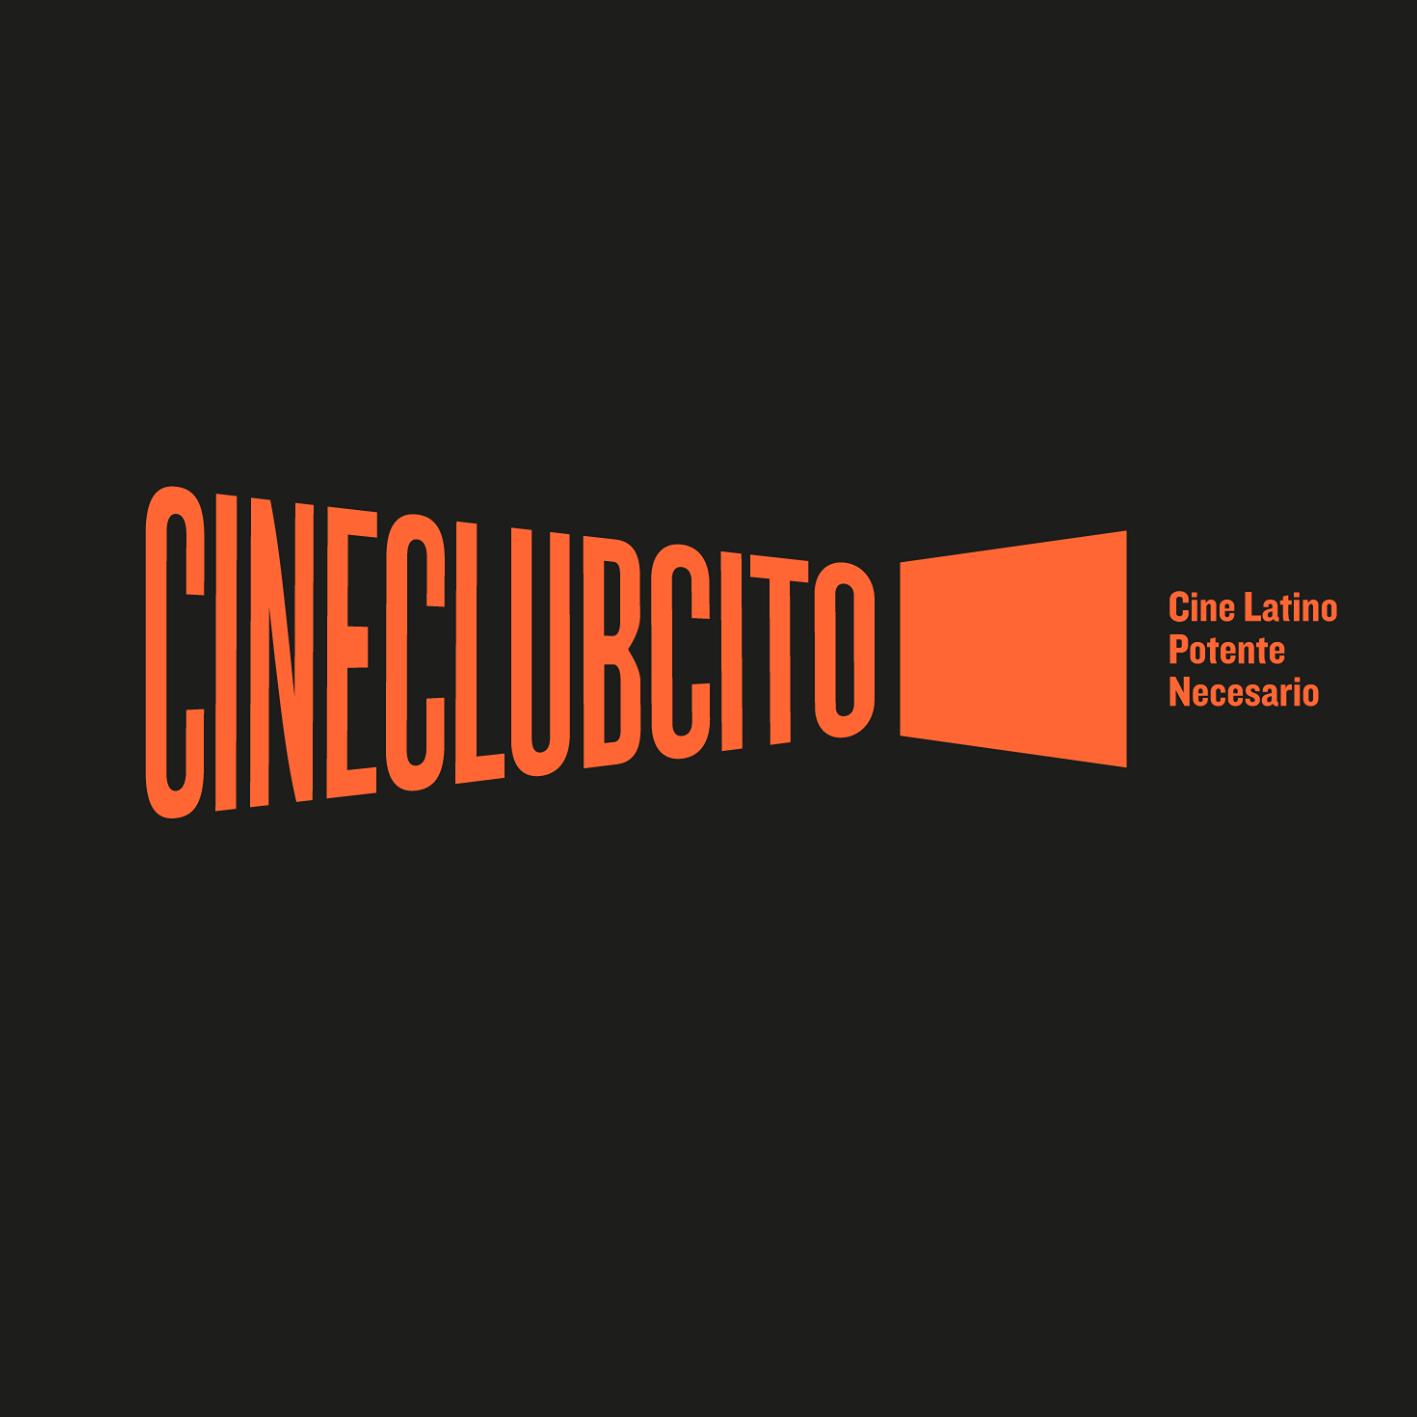 Cineclubcito